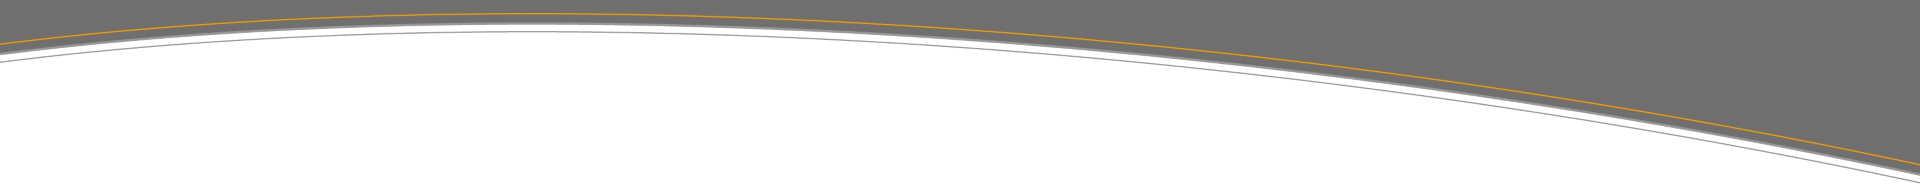 Brücke-Bogen-oben-frei